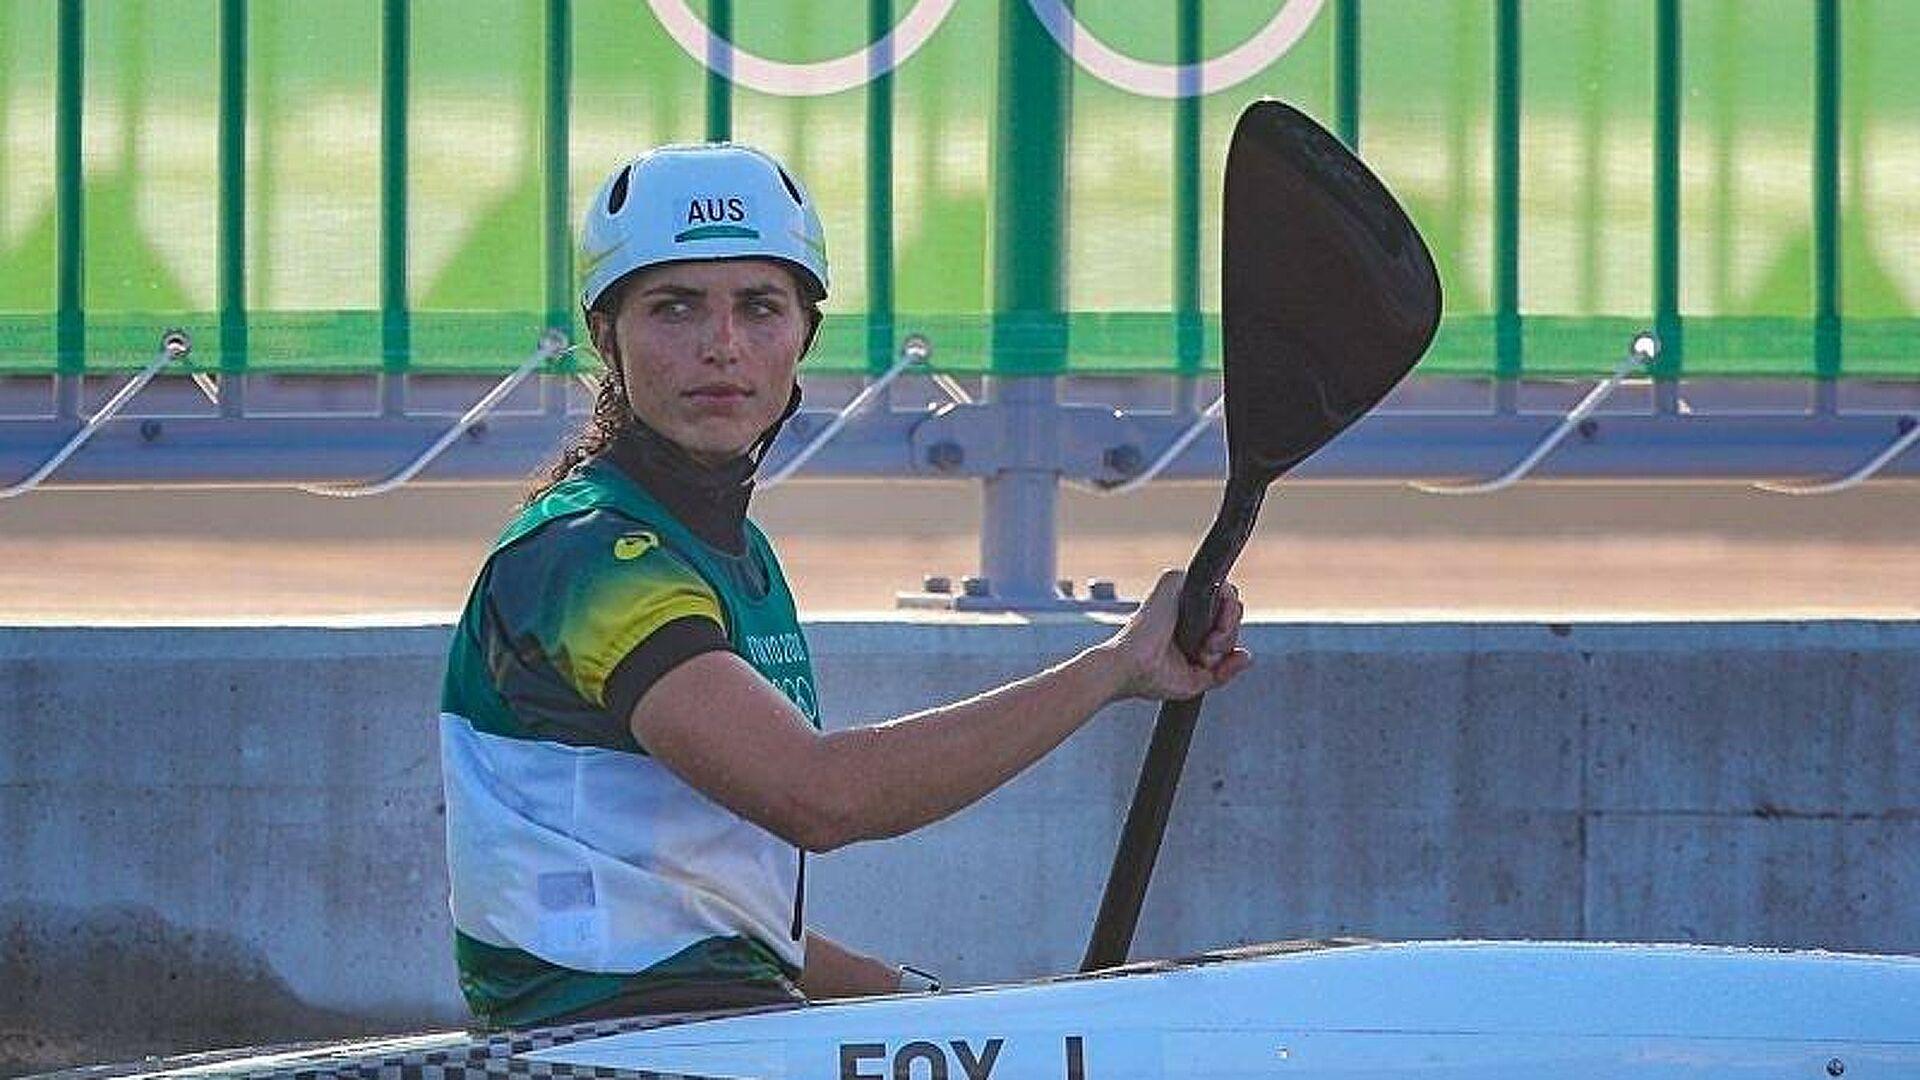 Презерватив помог австралийке выиграть золото Олимпиады